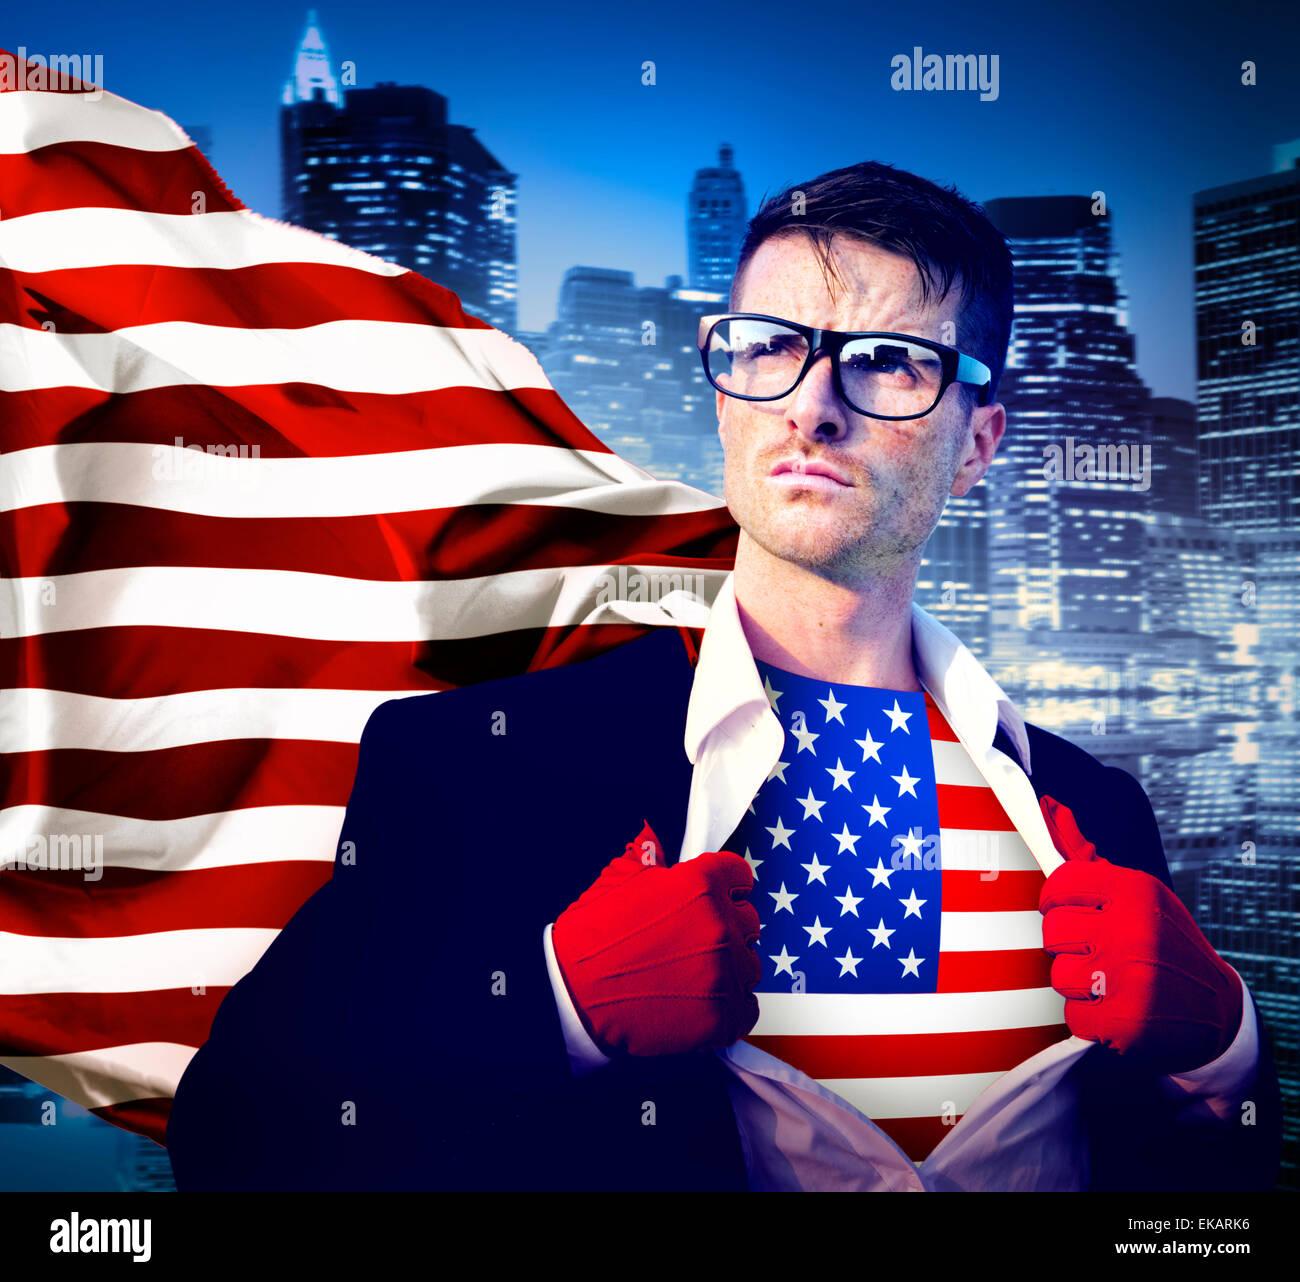 Superhero Businessman American Flag Patriotism National Flag Concept - Stock Image